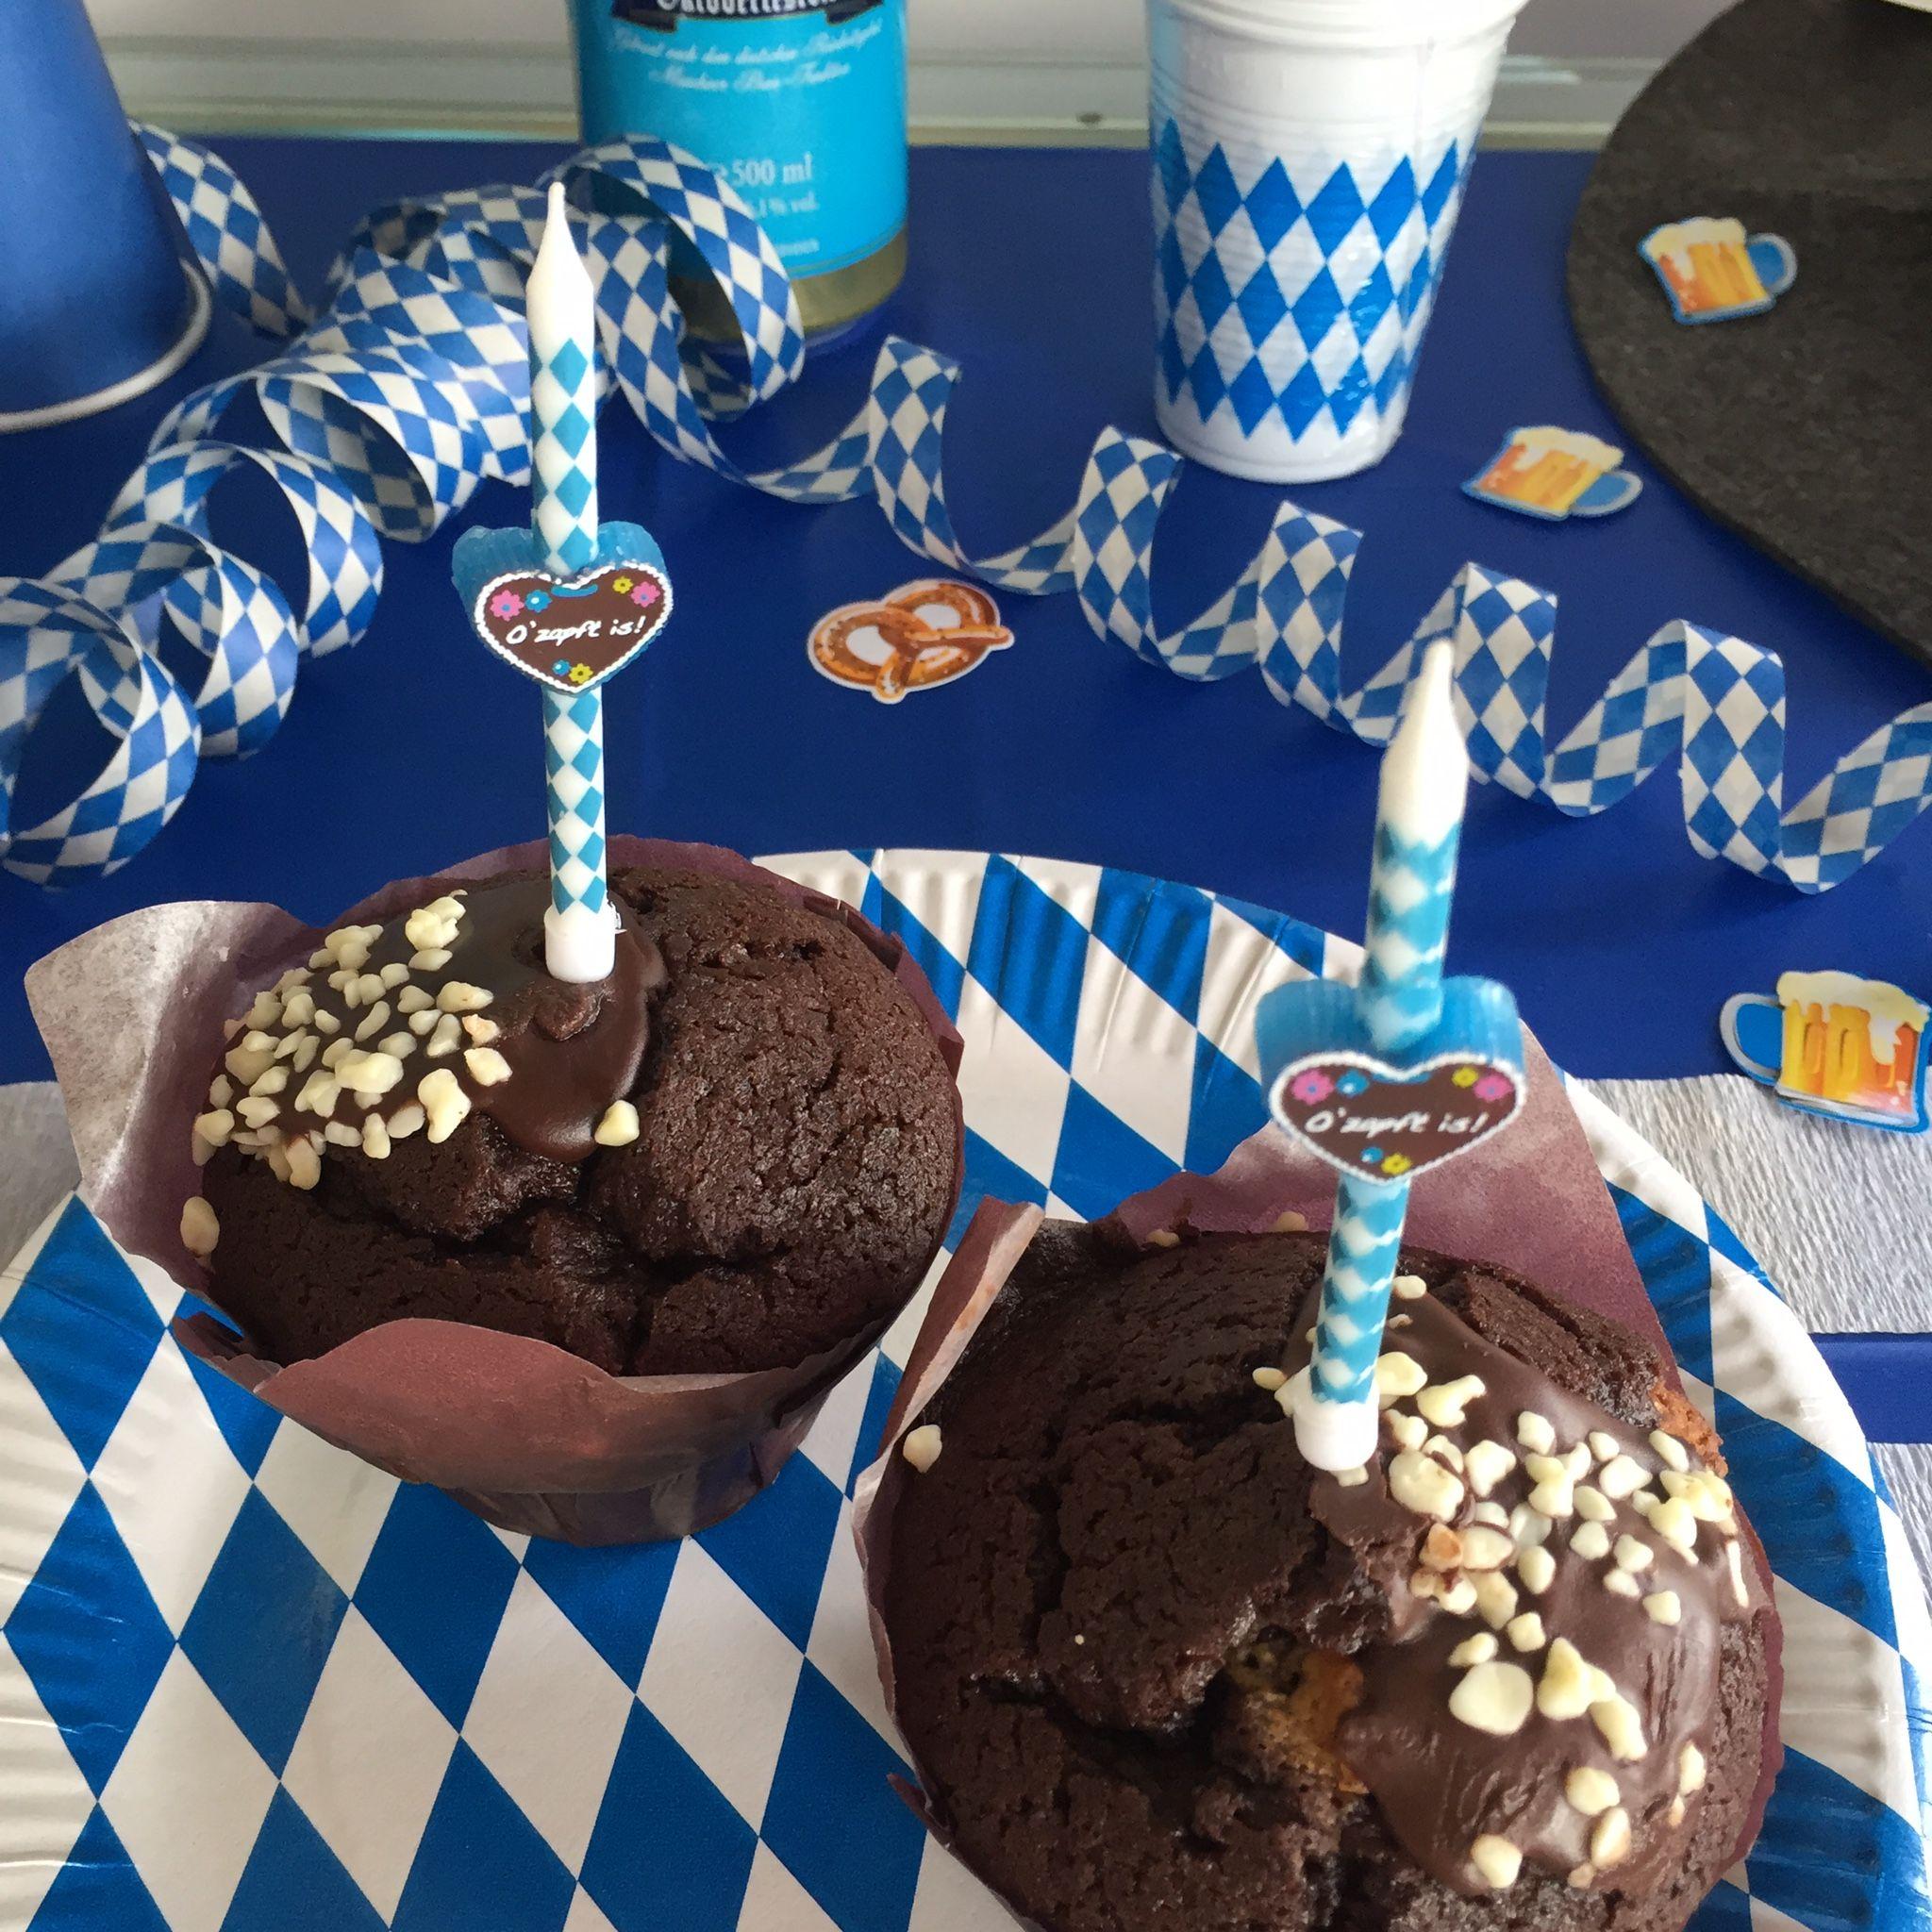 Witzige Kuchenkerzen Mehr Deko Oktoberfest Gubts Jetzt Bei Yokki